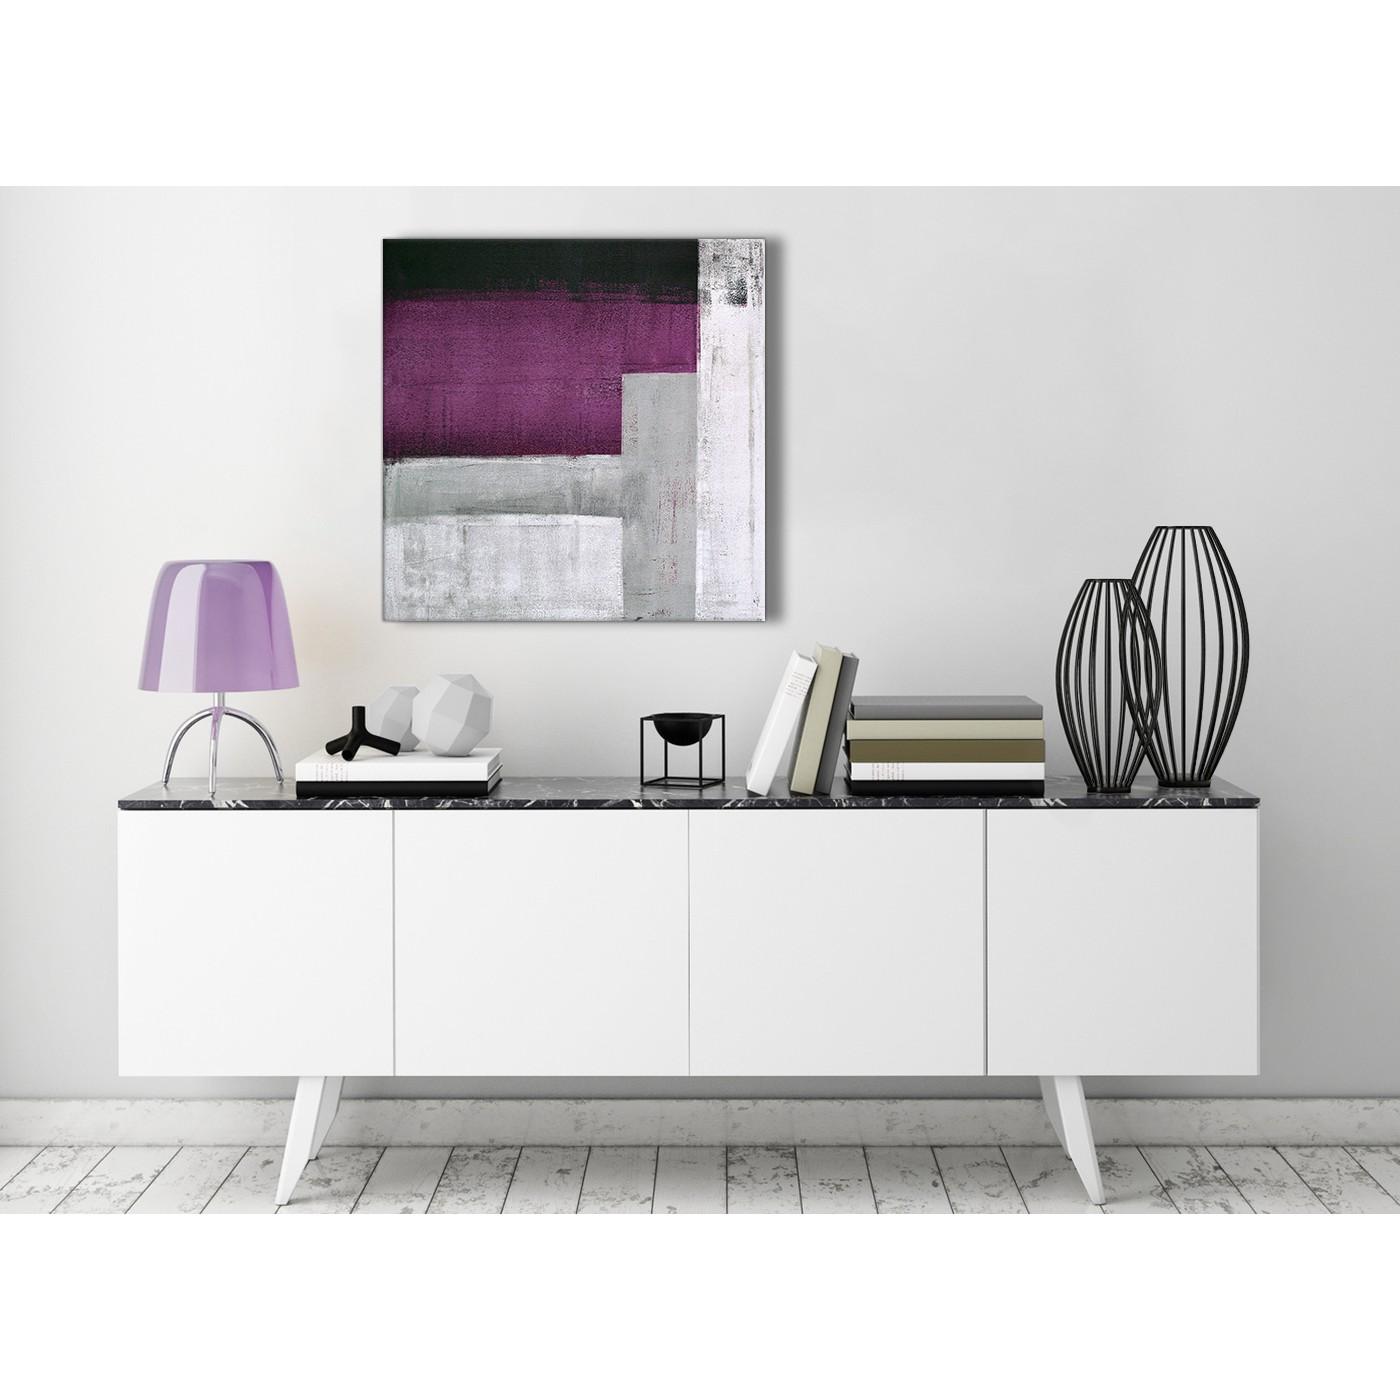 Plum Purple Grey Painting Kitchen Canvas Pictures: Purple Grey Painting Kitchen Canvas Pictures Decor